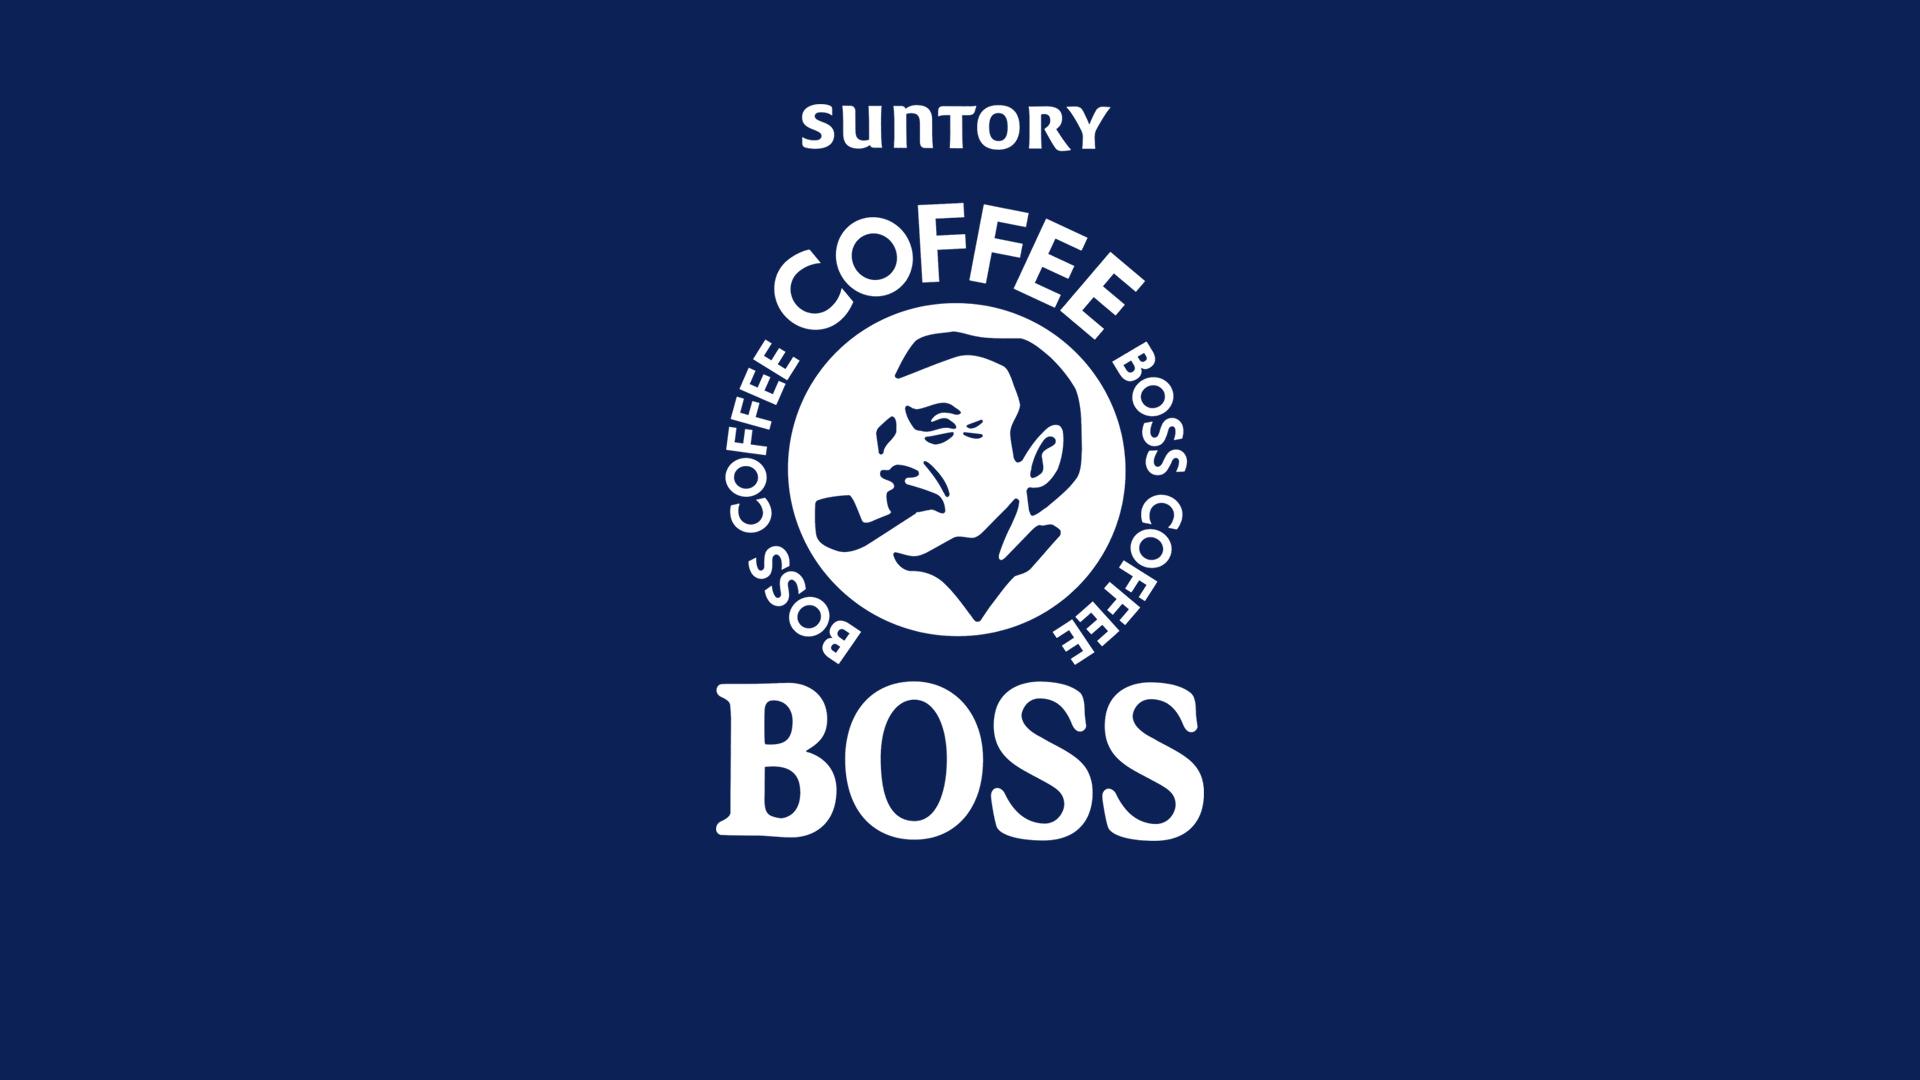 Art Work Japan サントリー ボス Suntory Boss Wallpaper 壁紙